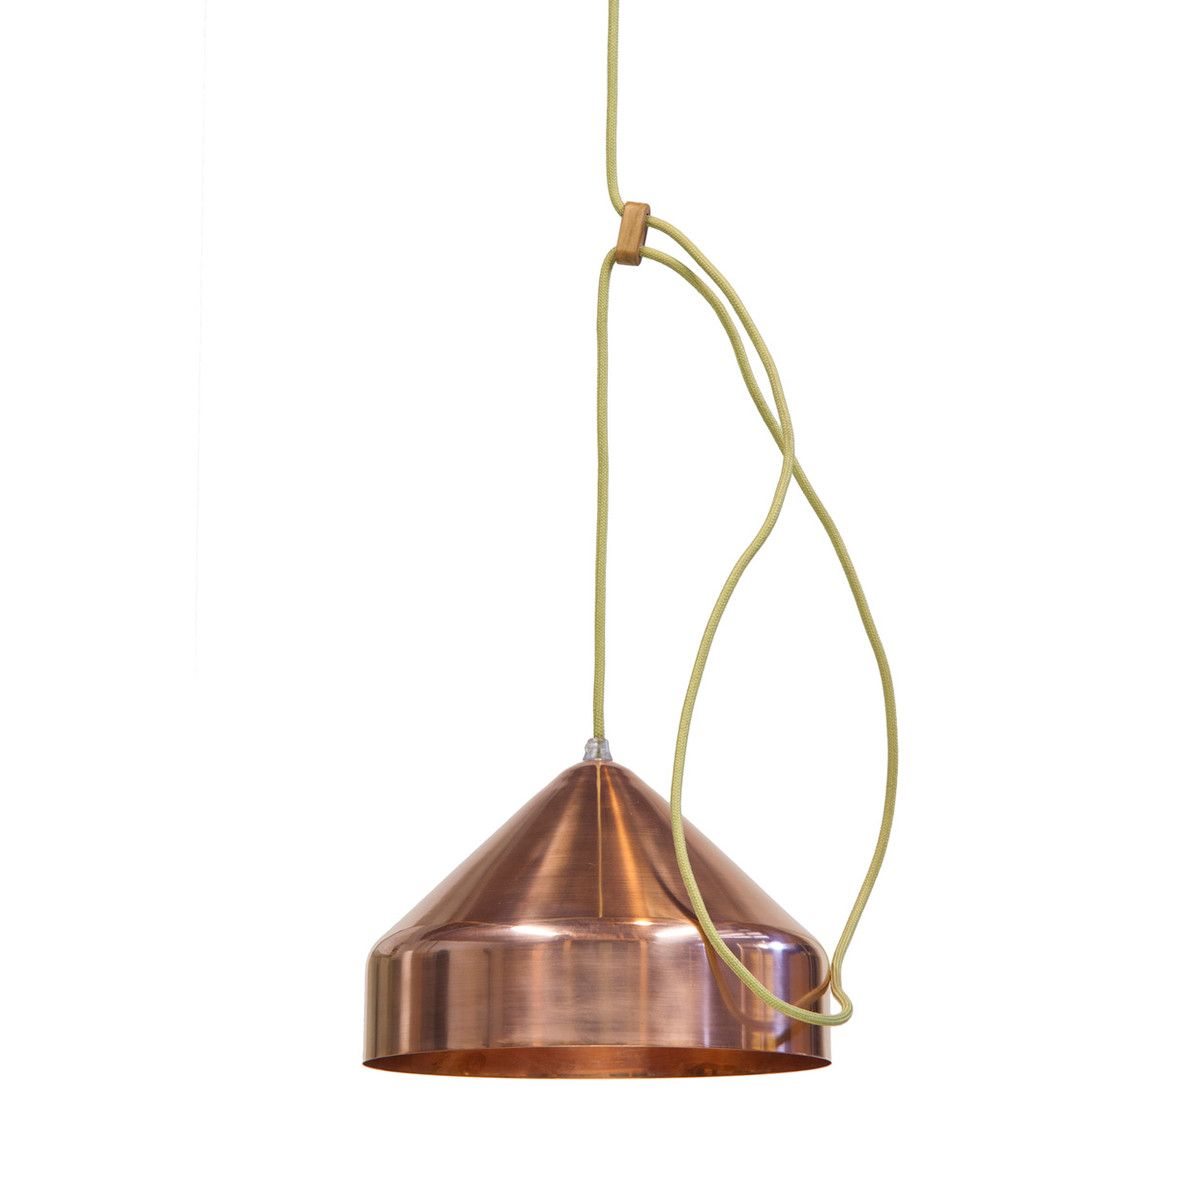 eu.Fab.com | Kupferlampe Lloop Kupfer